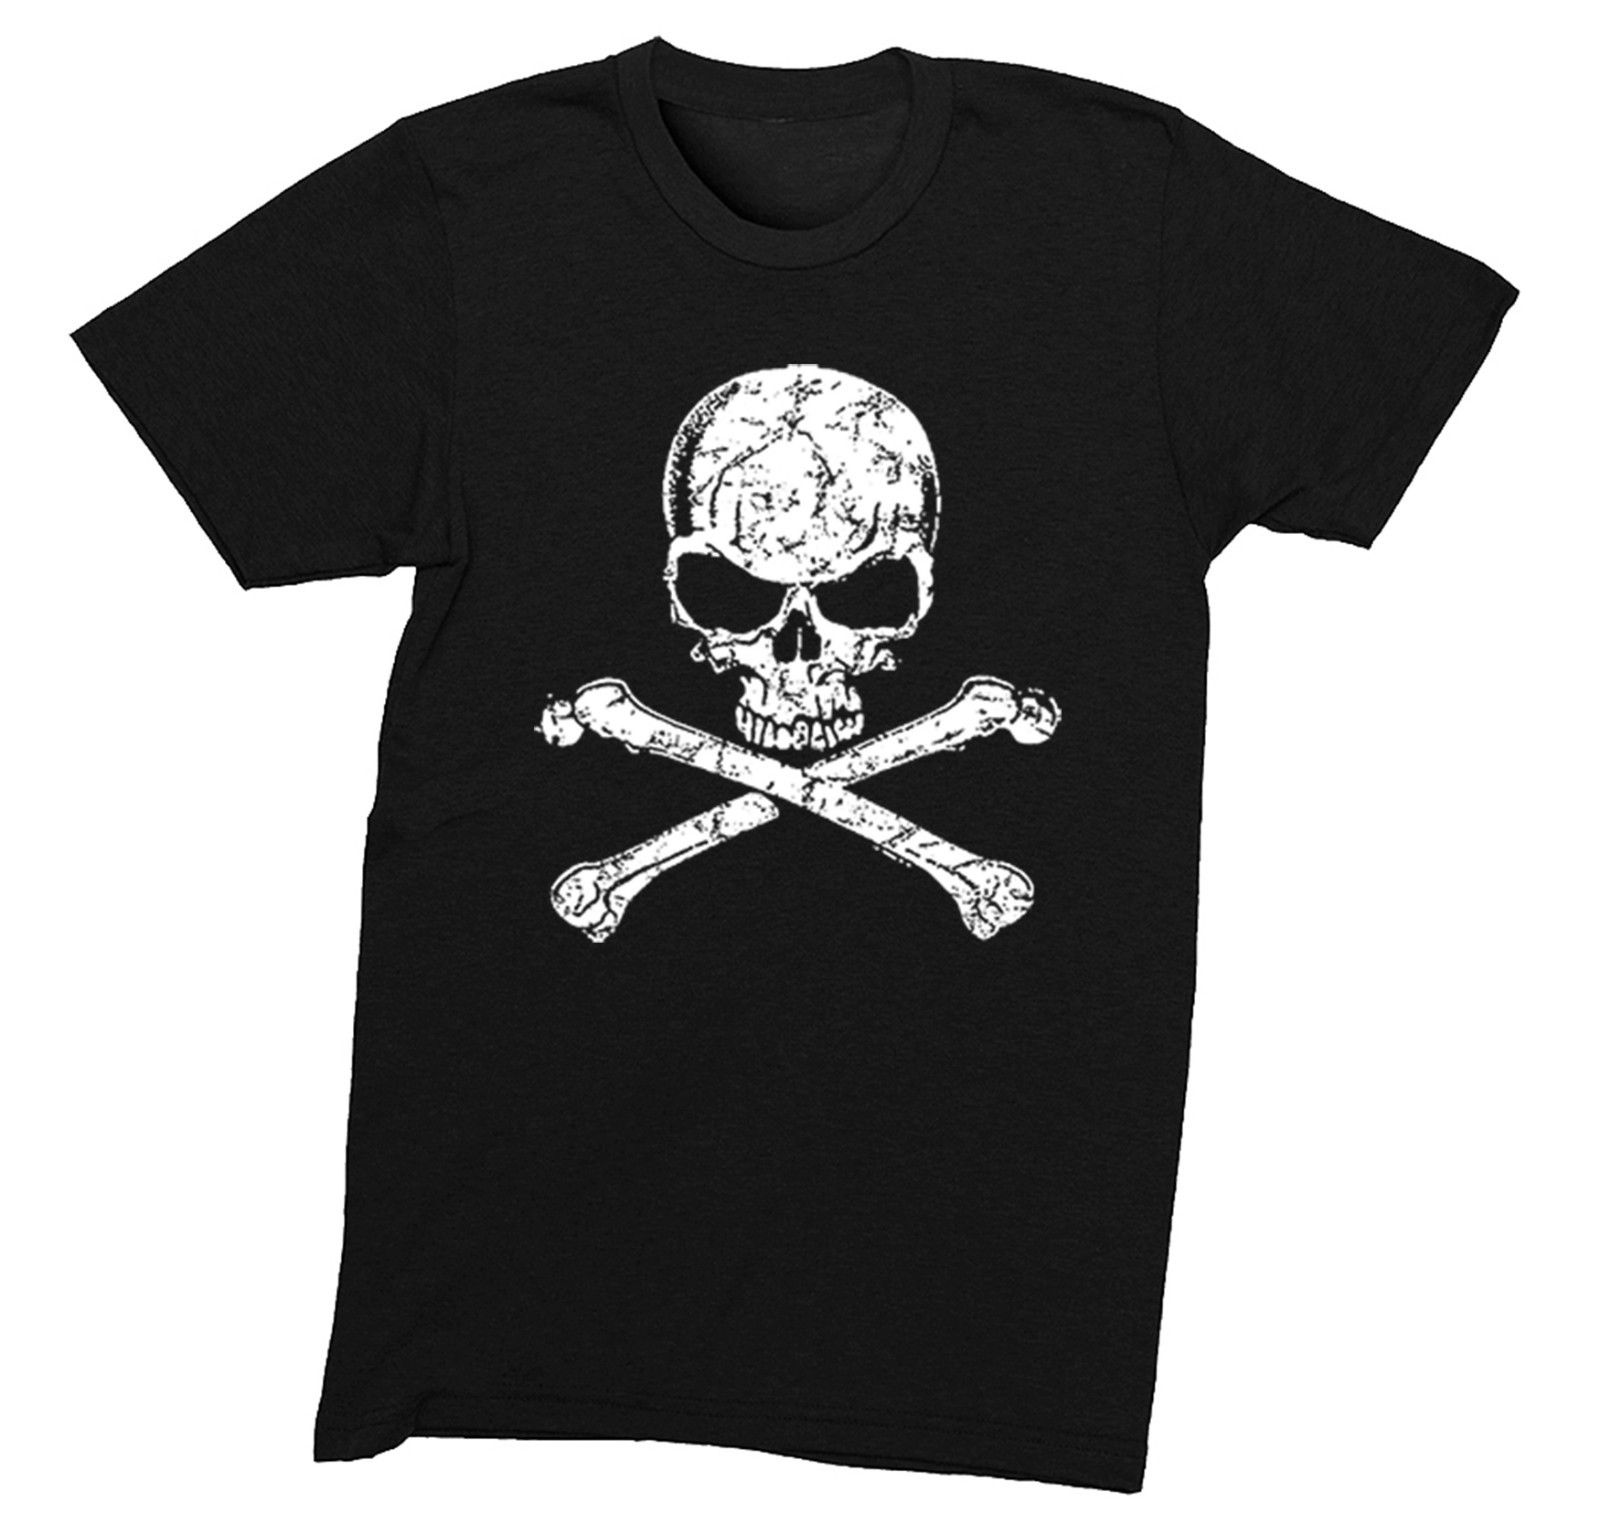 Herren Distressed Weiß Totenkopf Pirate Jolly Roger Gaspar T-Shirt